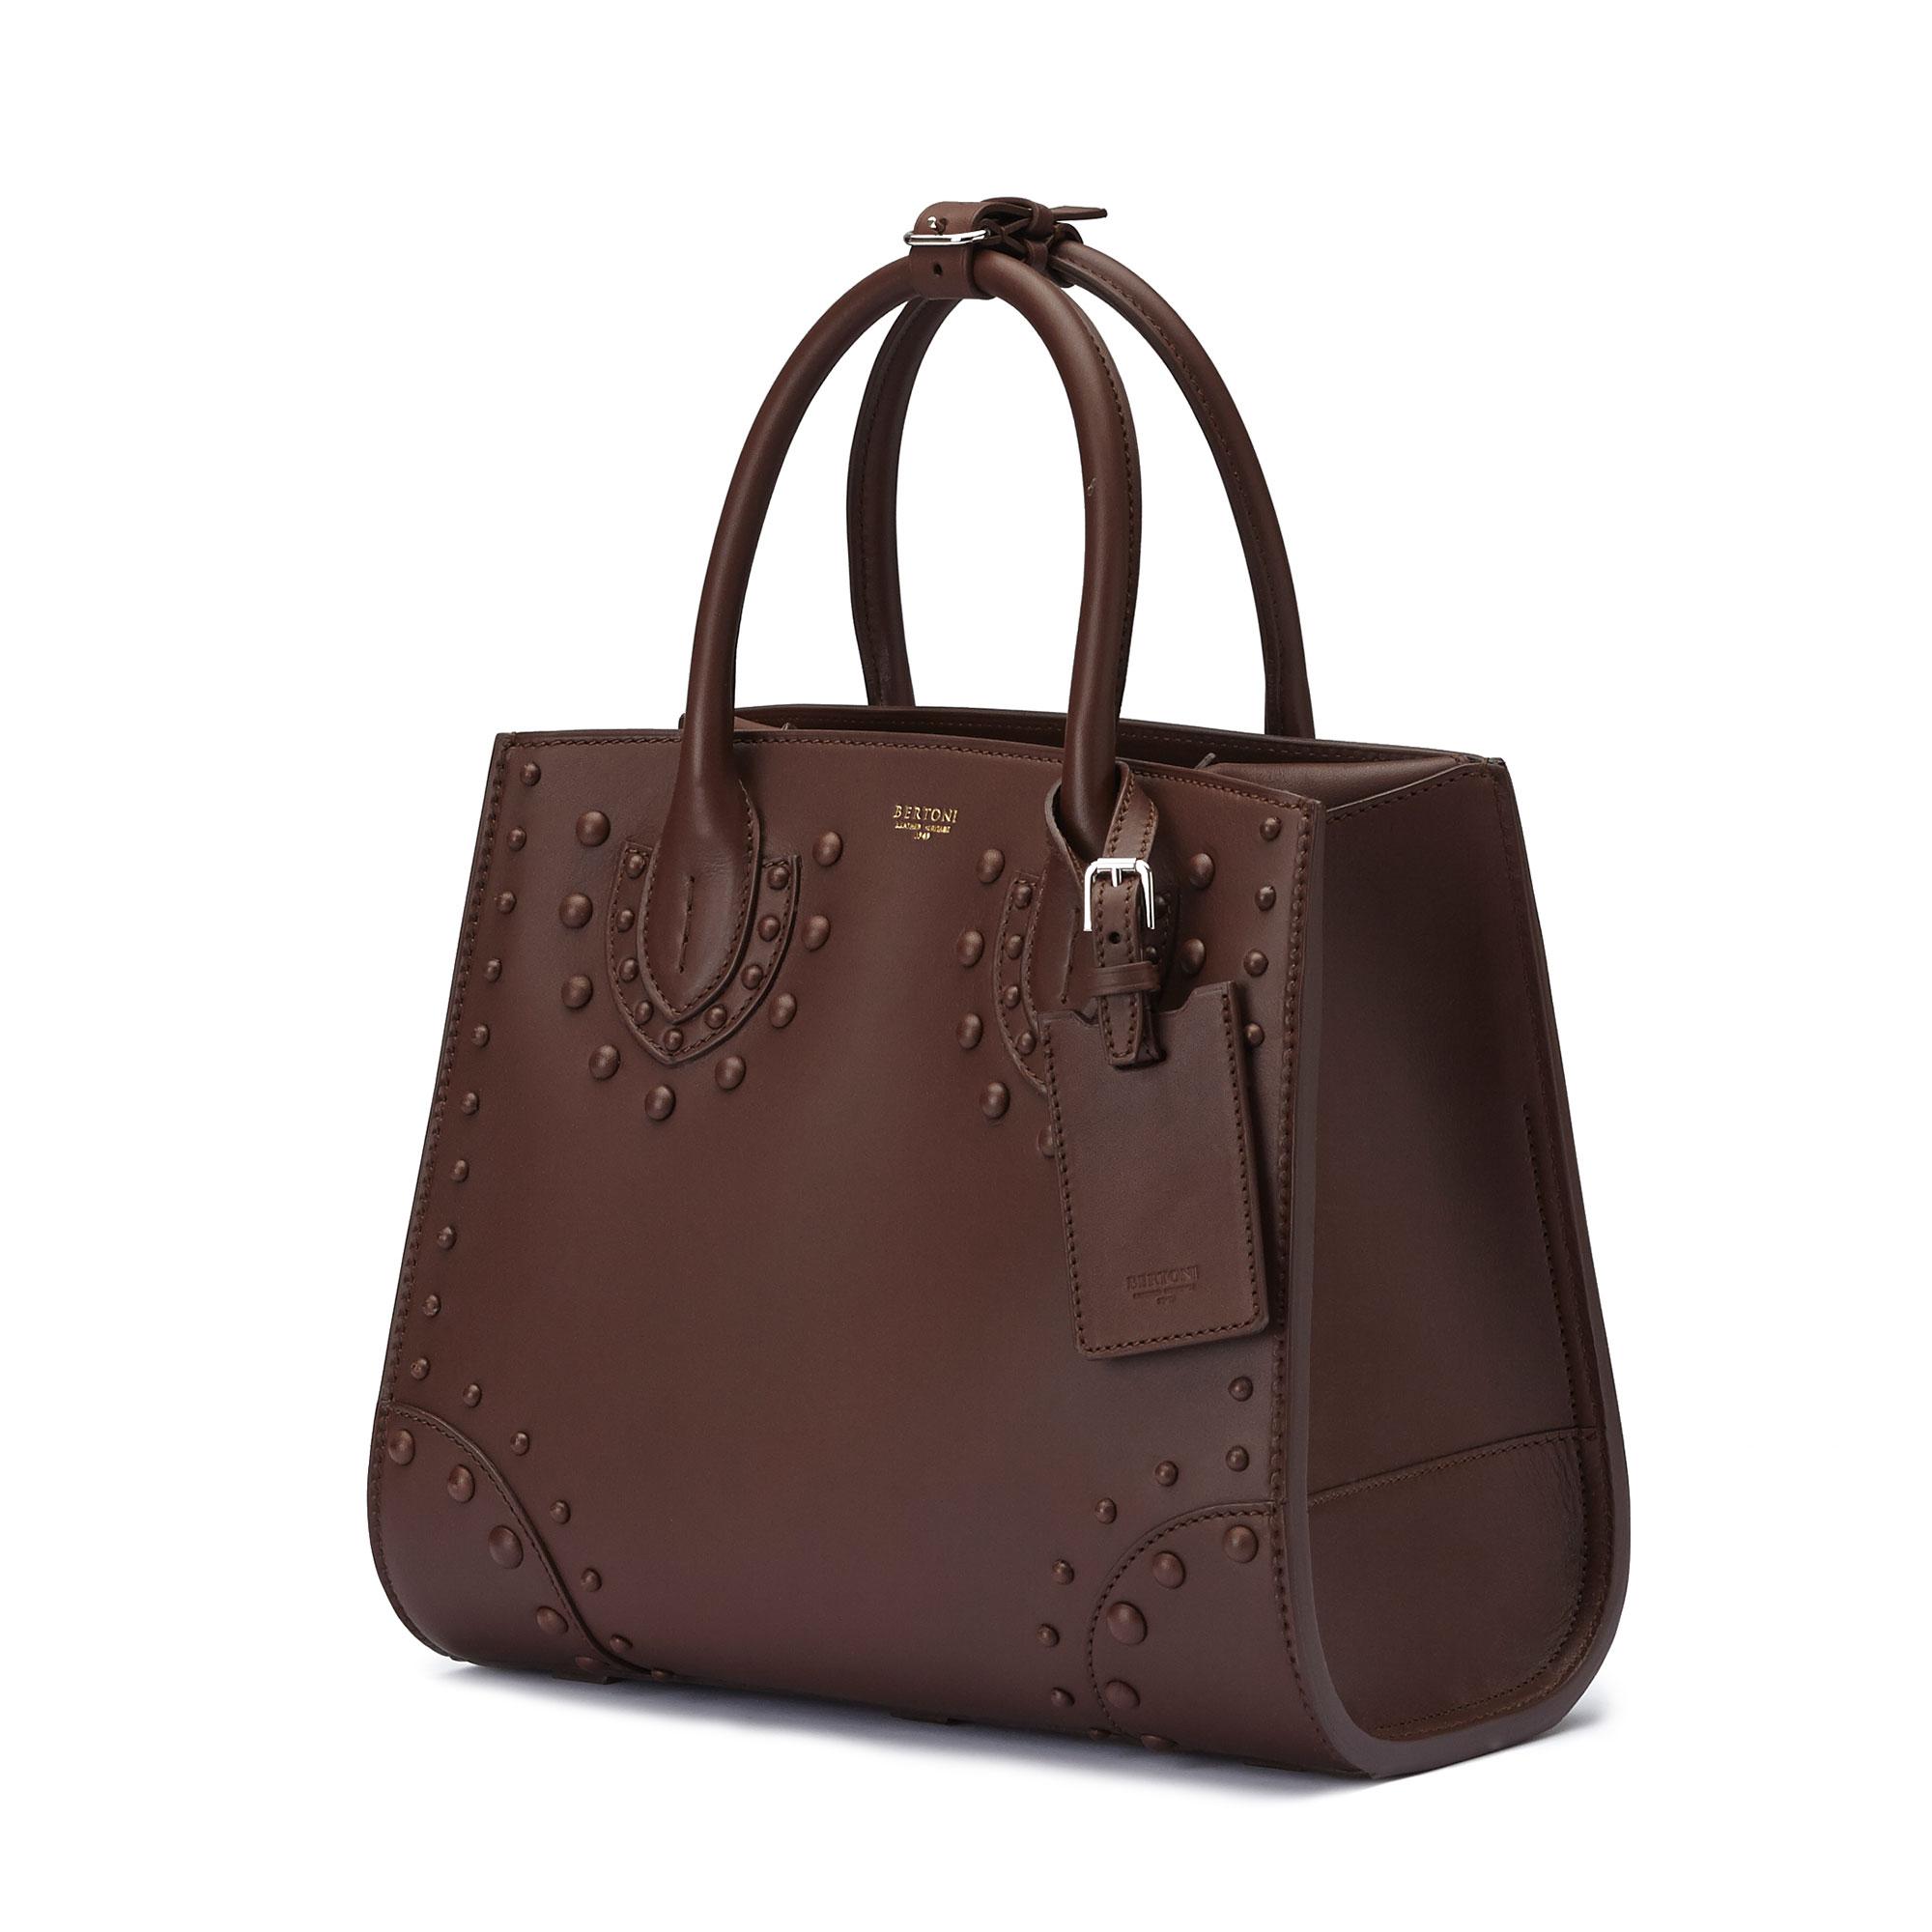 The brown french calf Darcy medium bag by Bertoni 1949 03